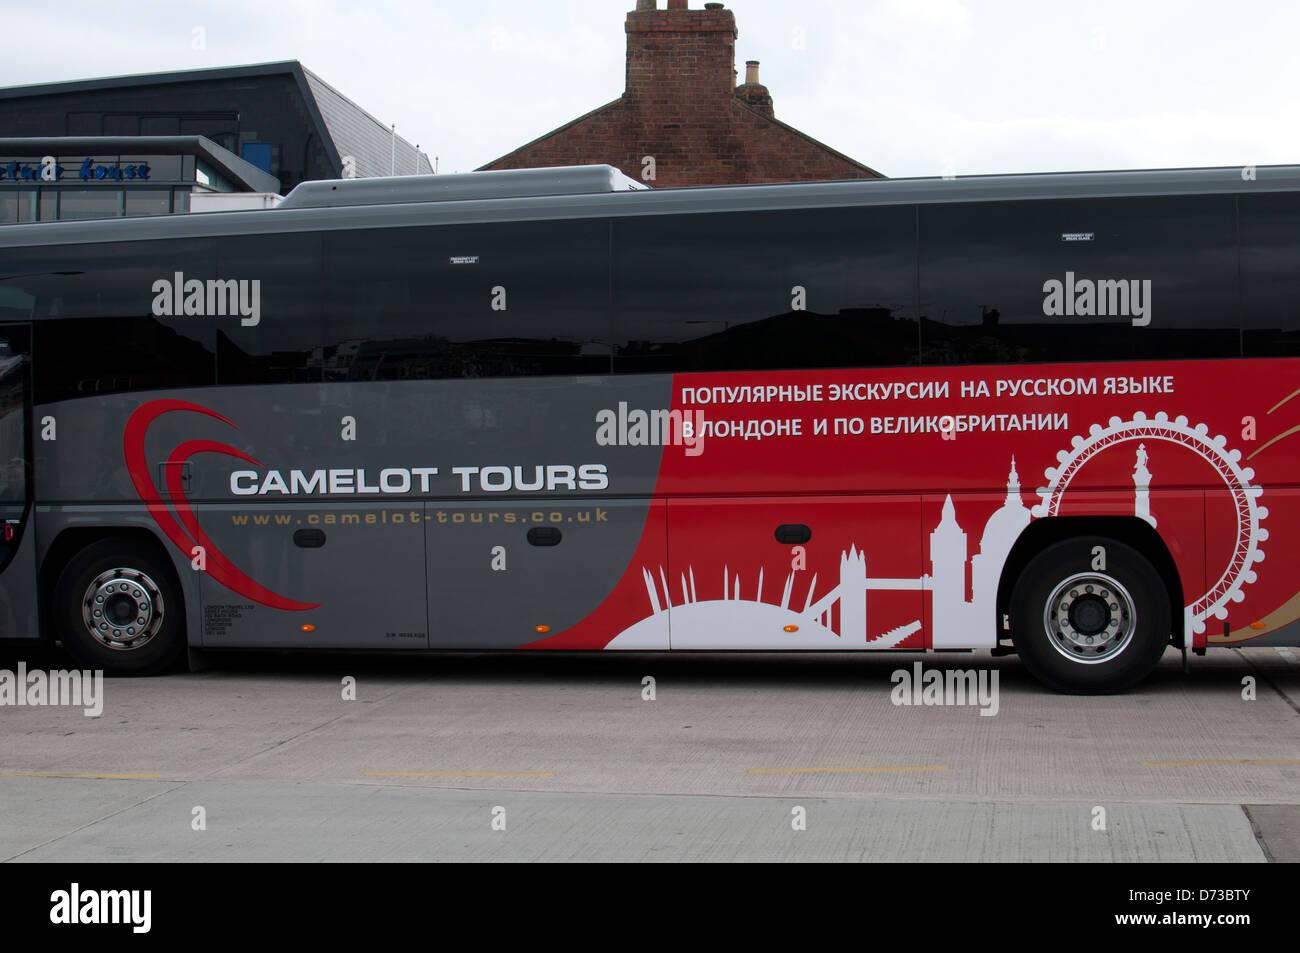 Camelot Tours coach - Stock Image